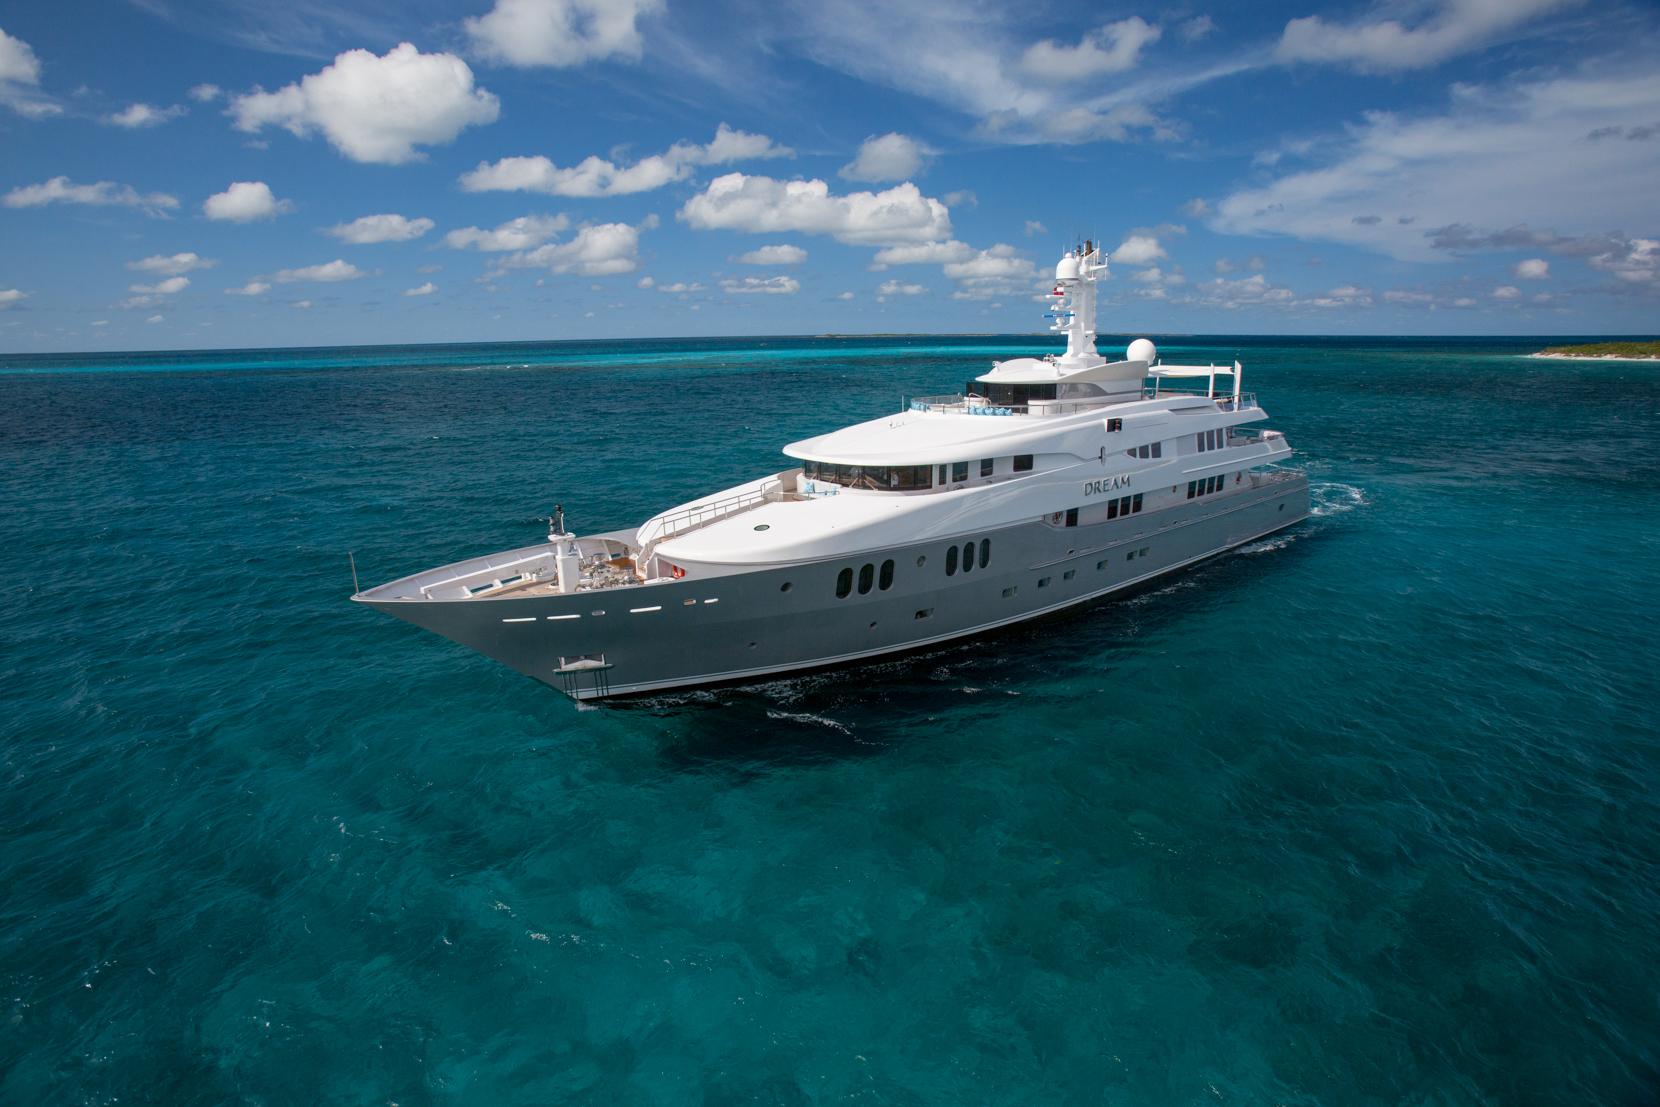 Luxury yacht DREAM - Built by Abeking & Rasmussen